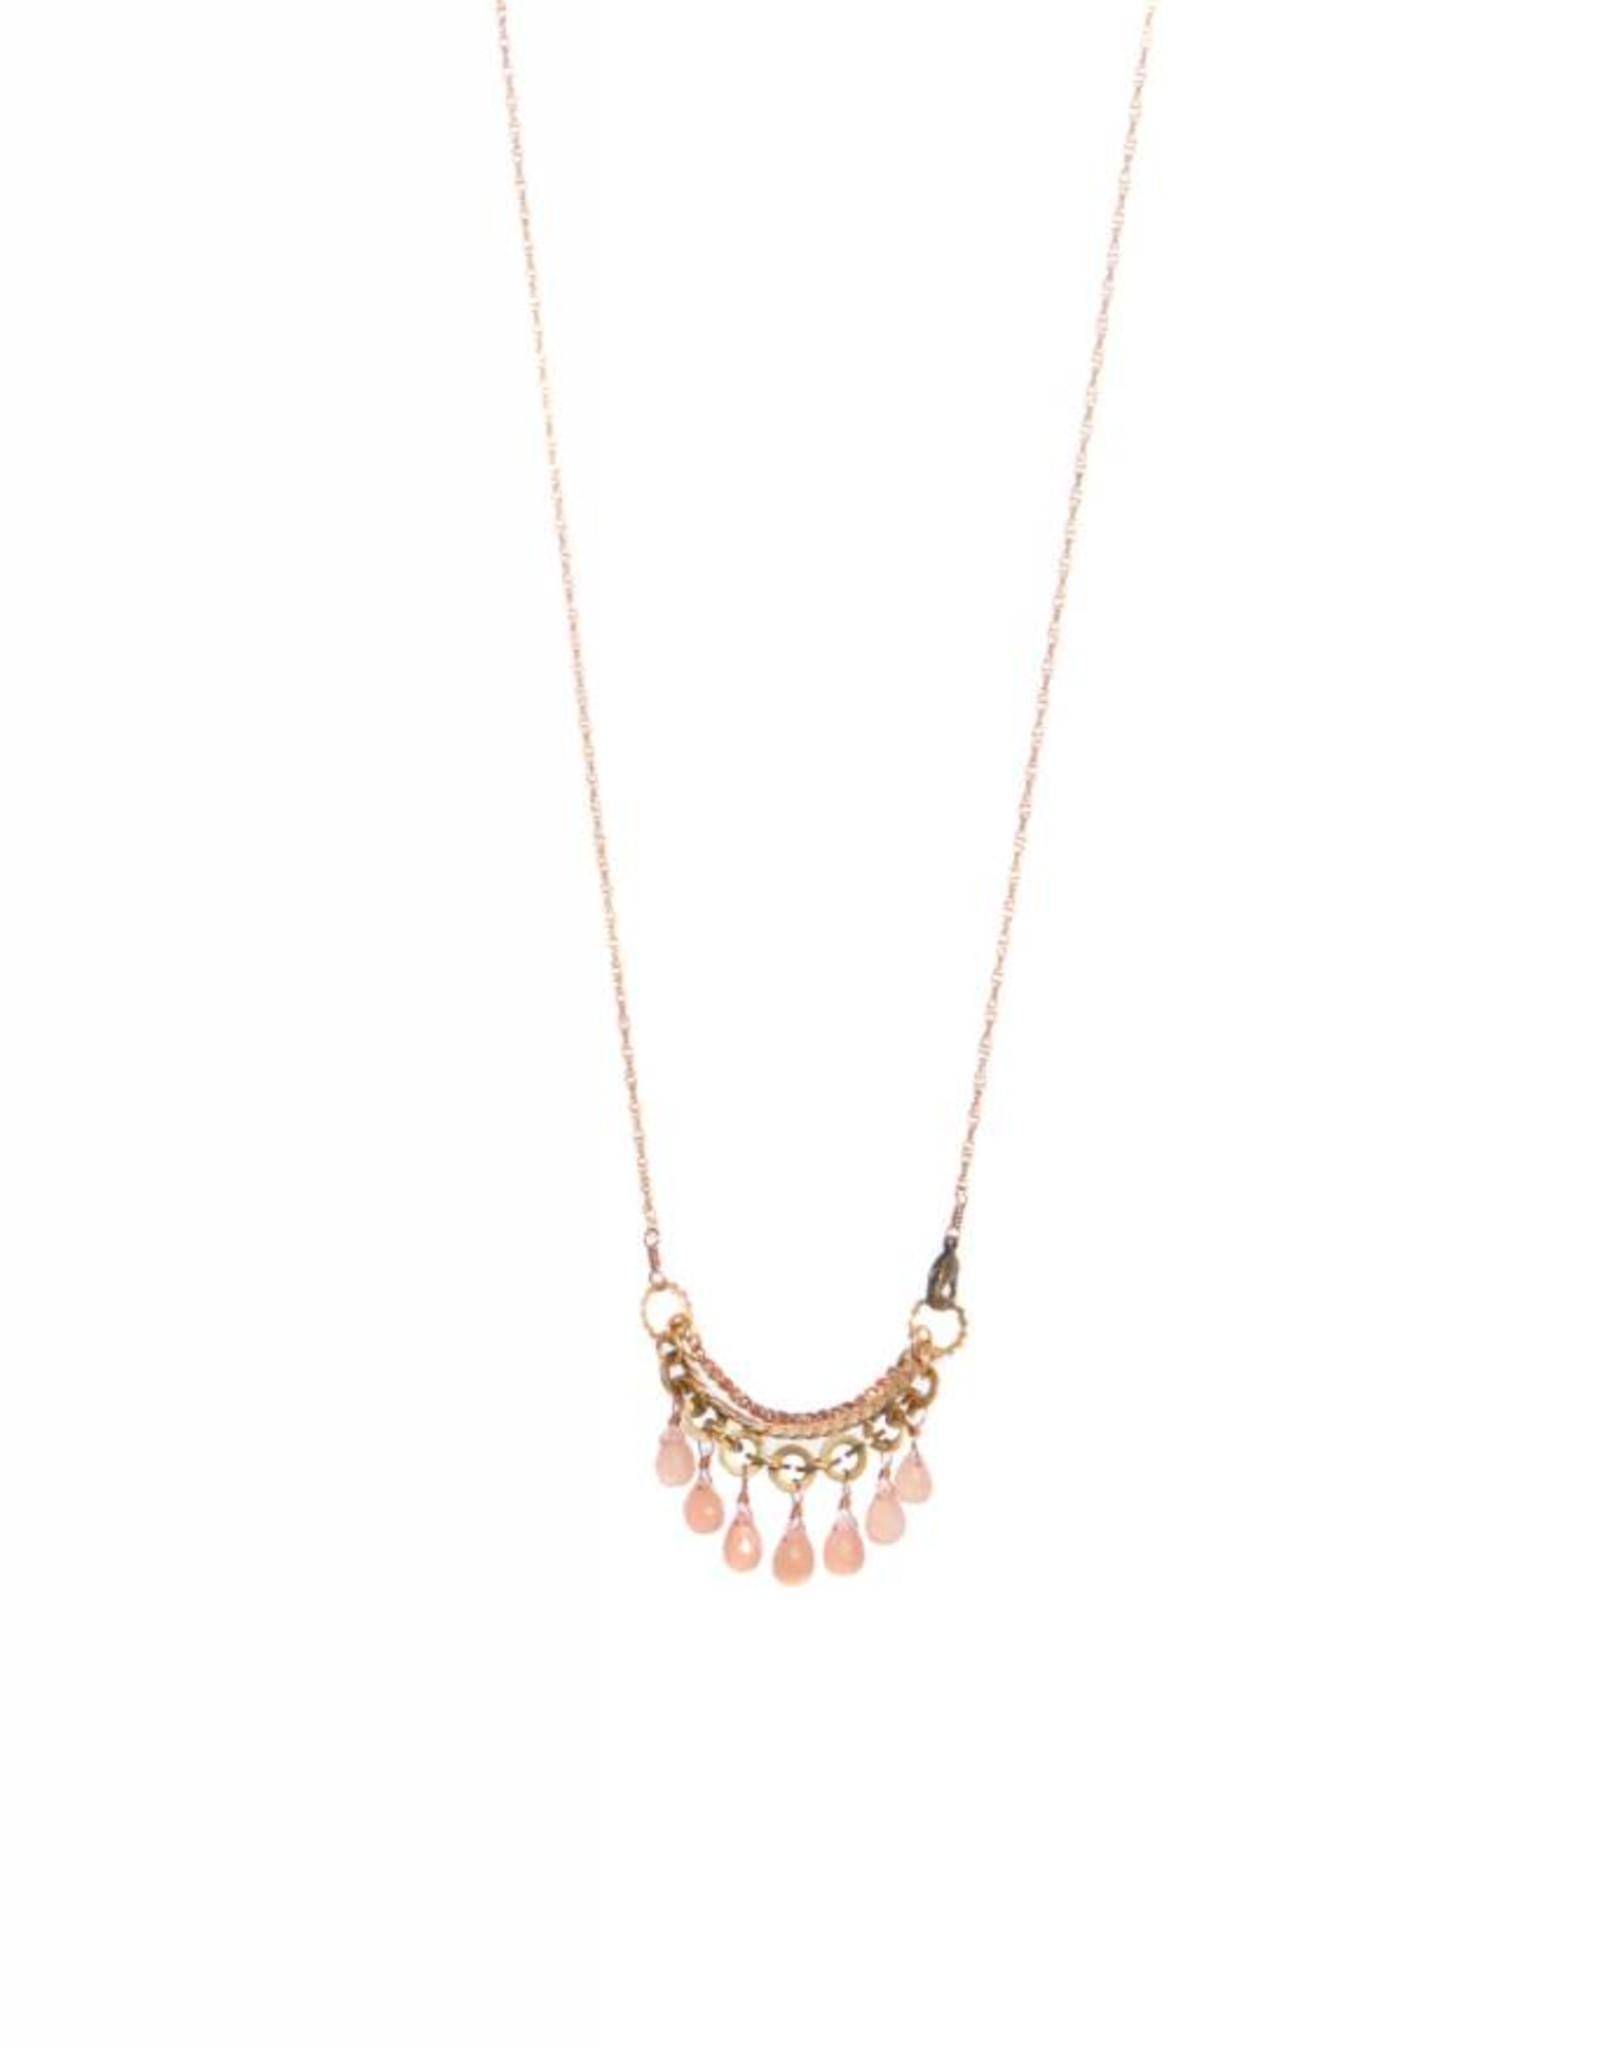 Hailey Gerrits Designs Eos Necklace - Peach Moonstone